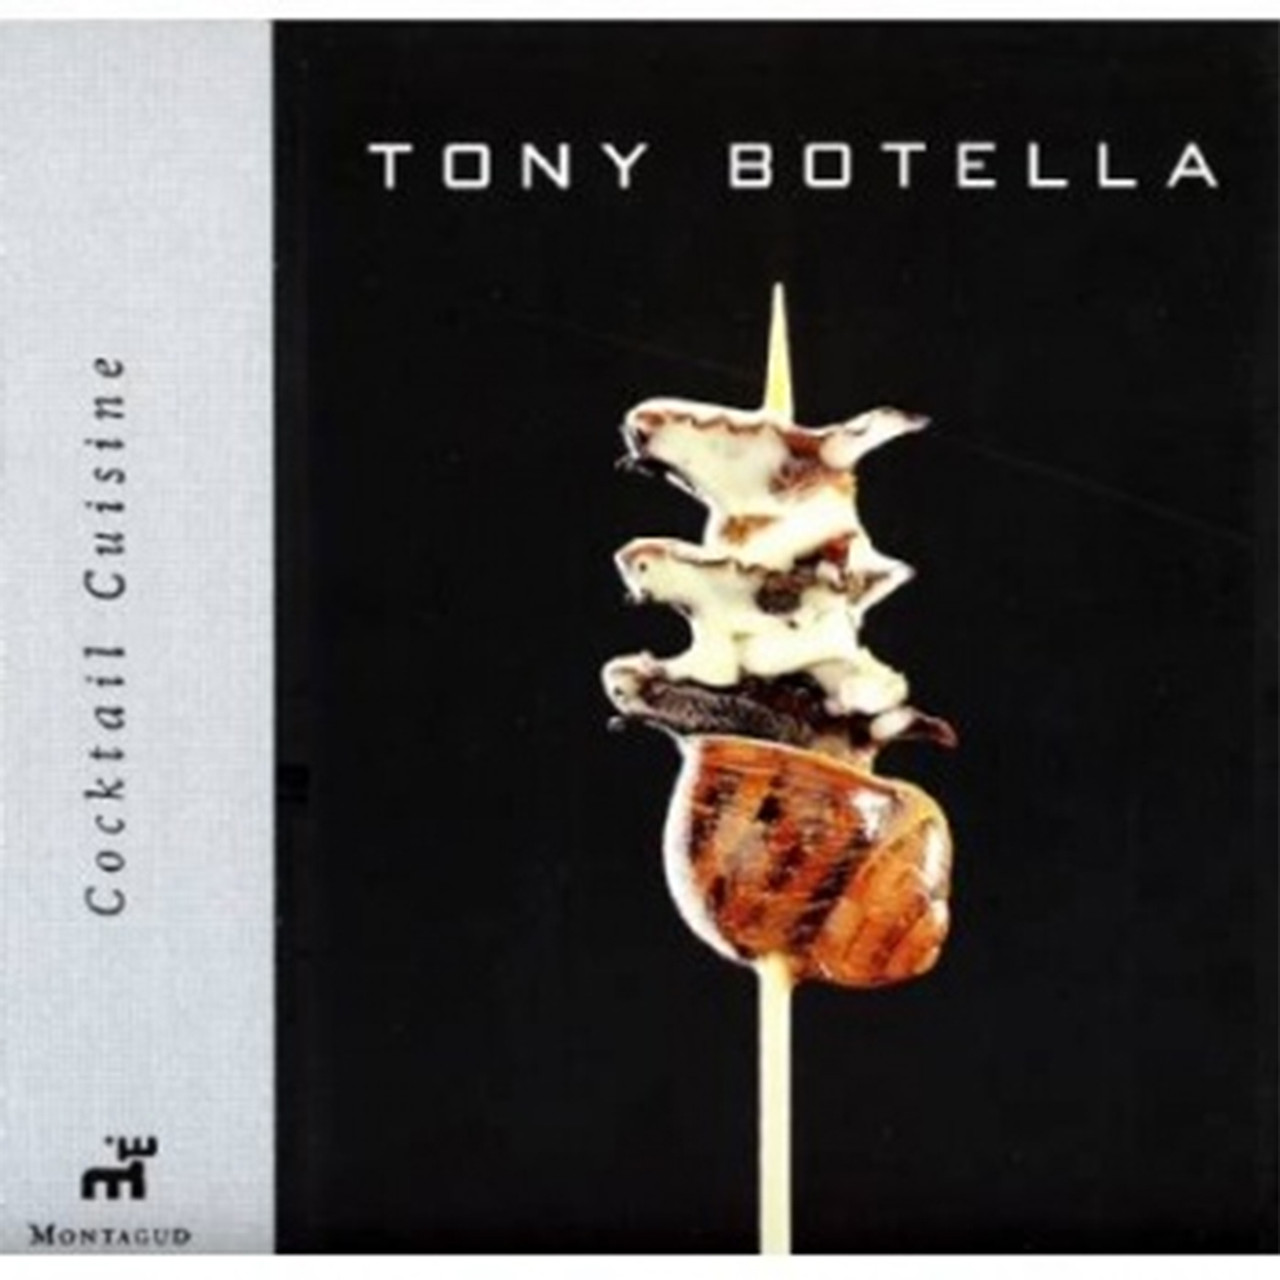 Cocktail Cuisine, Tony Botella